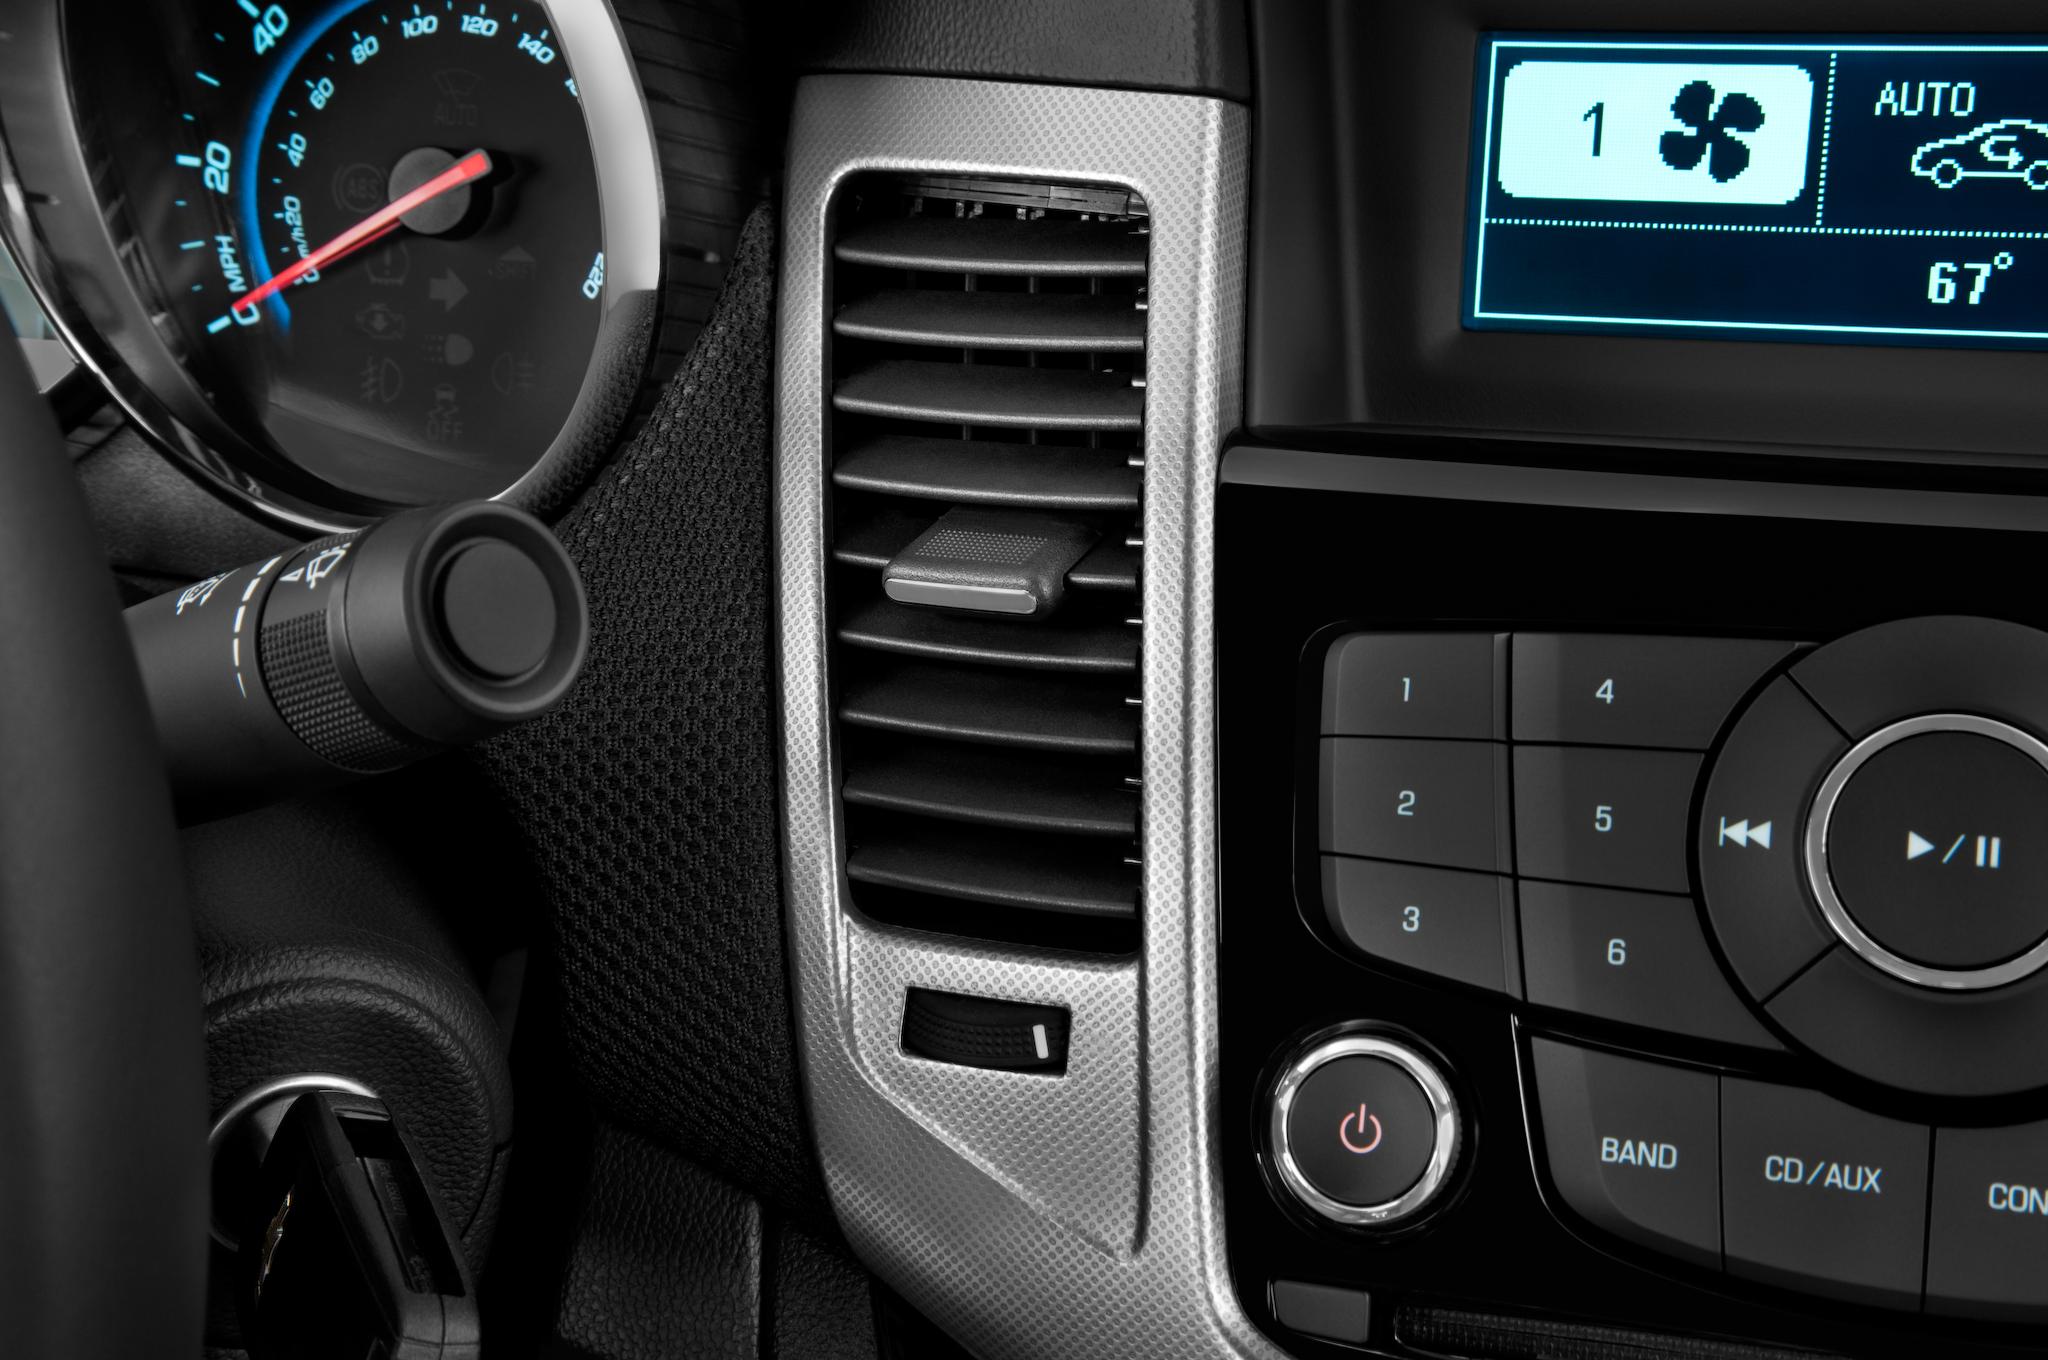 2012 Chevrolet Cruze 2LT - Editors' Notebook - Automobile